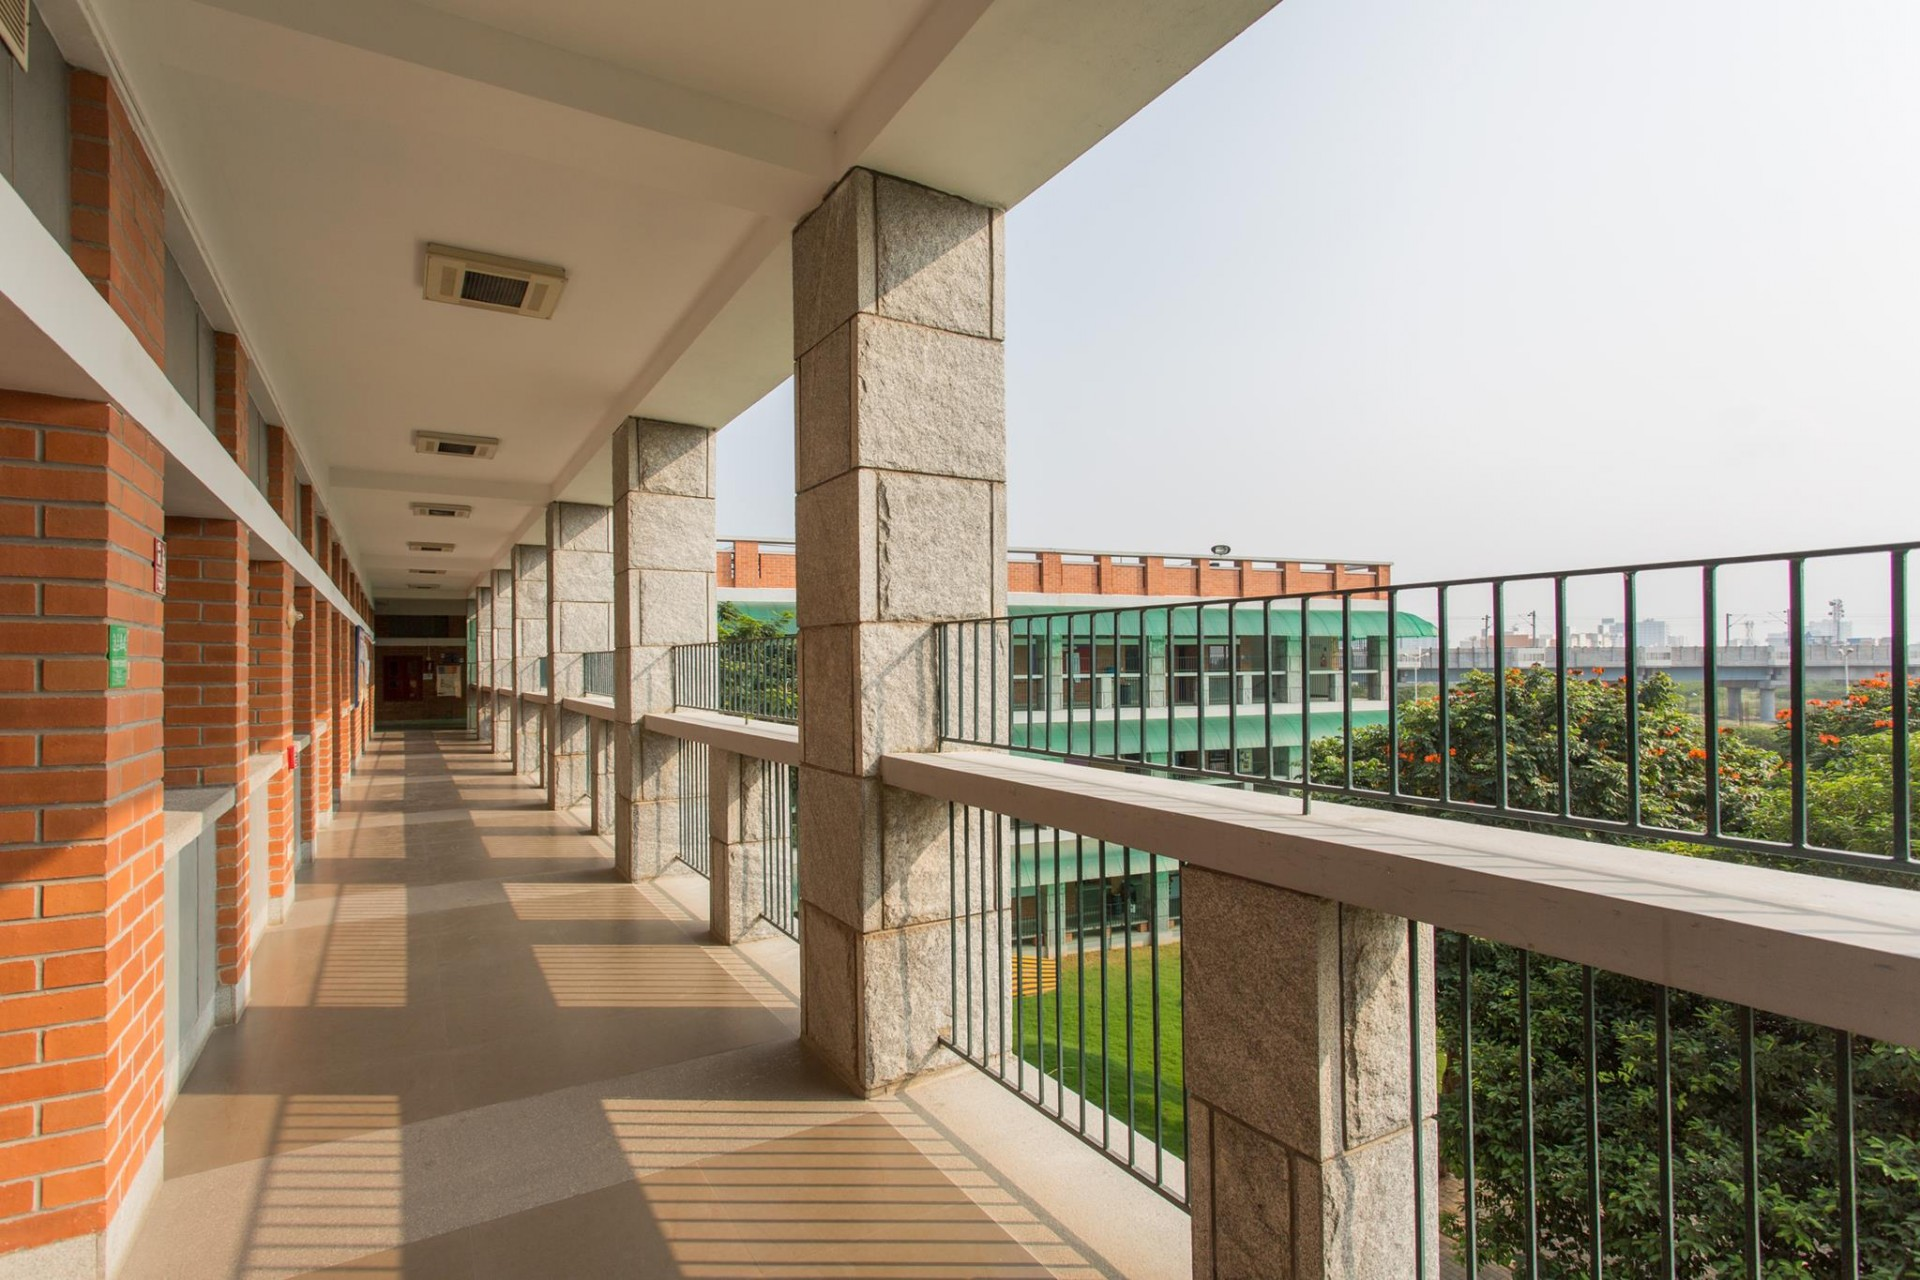 AMERICAN INTERNATIONAL SCHOOL - THARAMANI - CHENNAI Photos